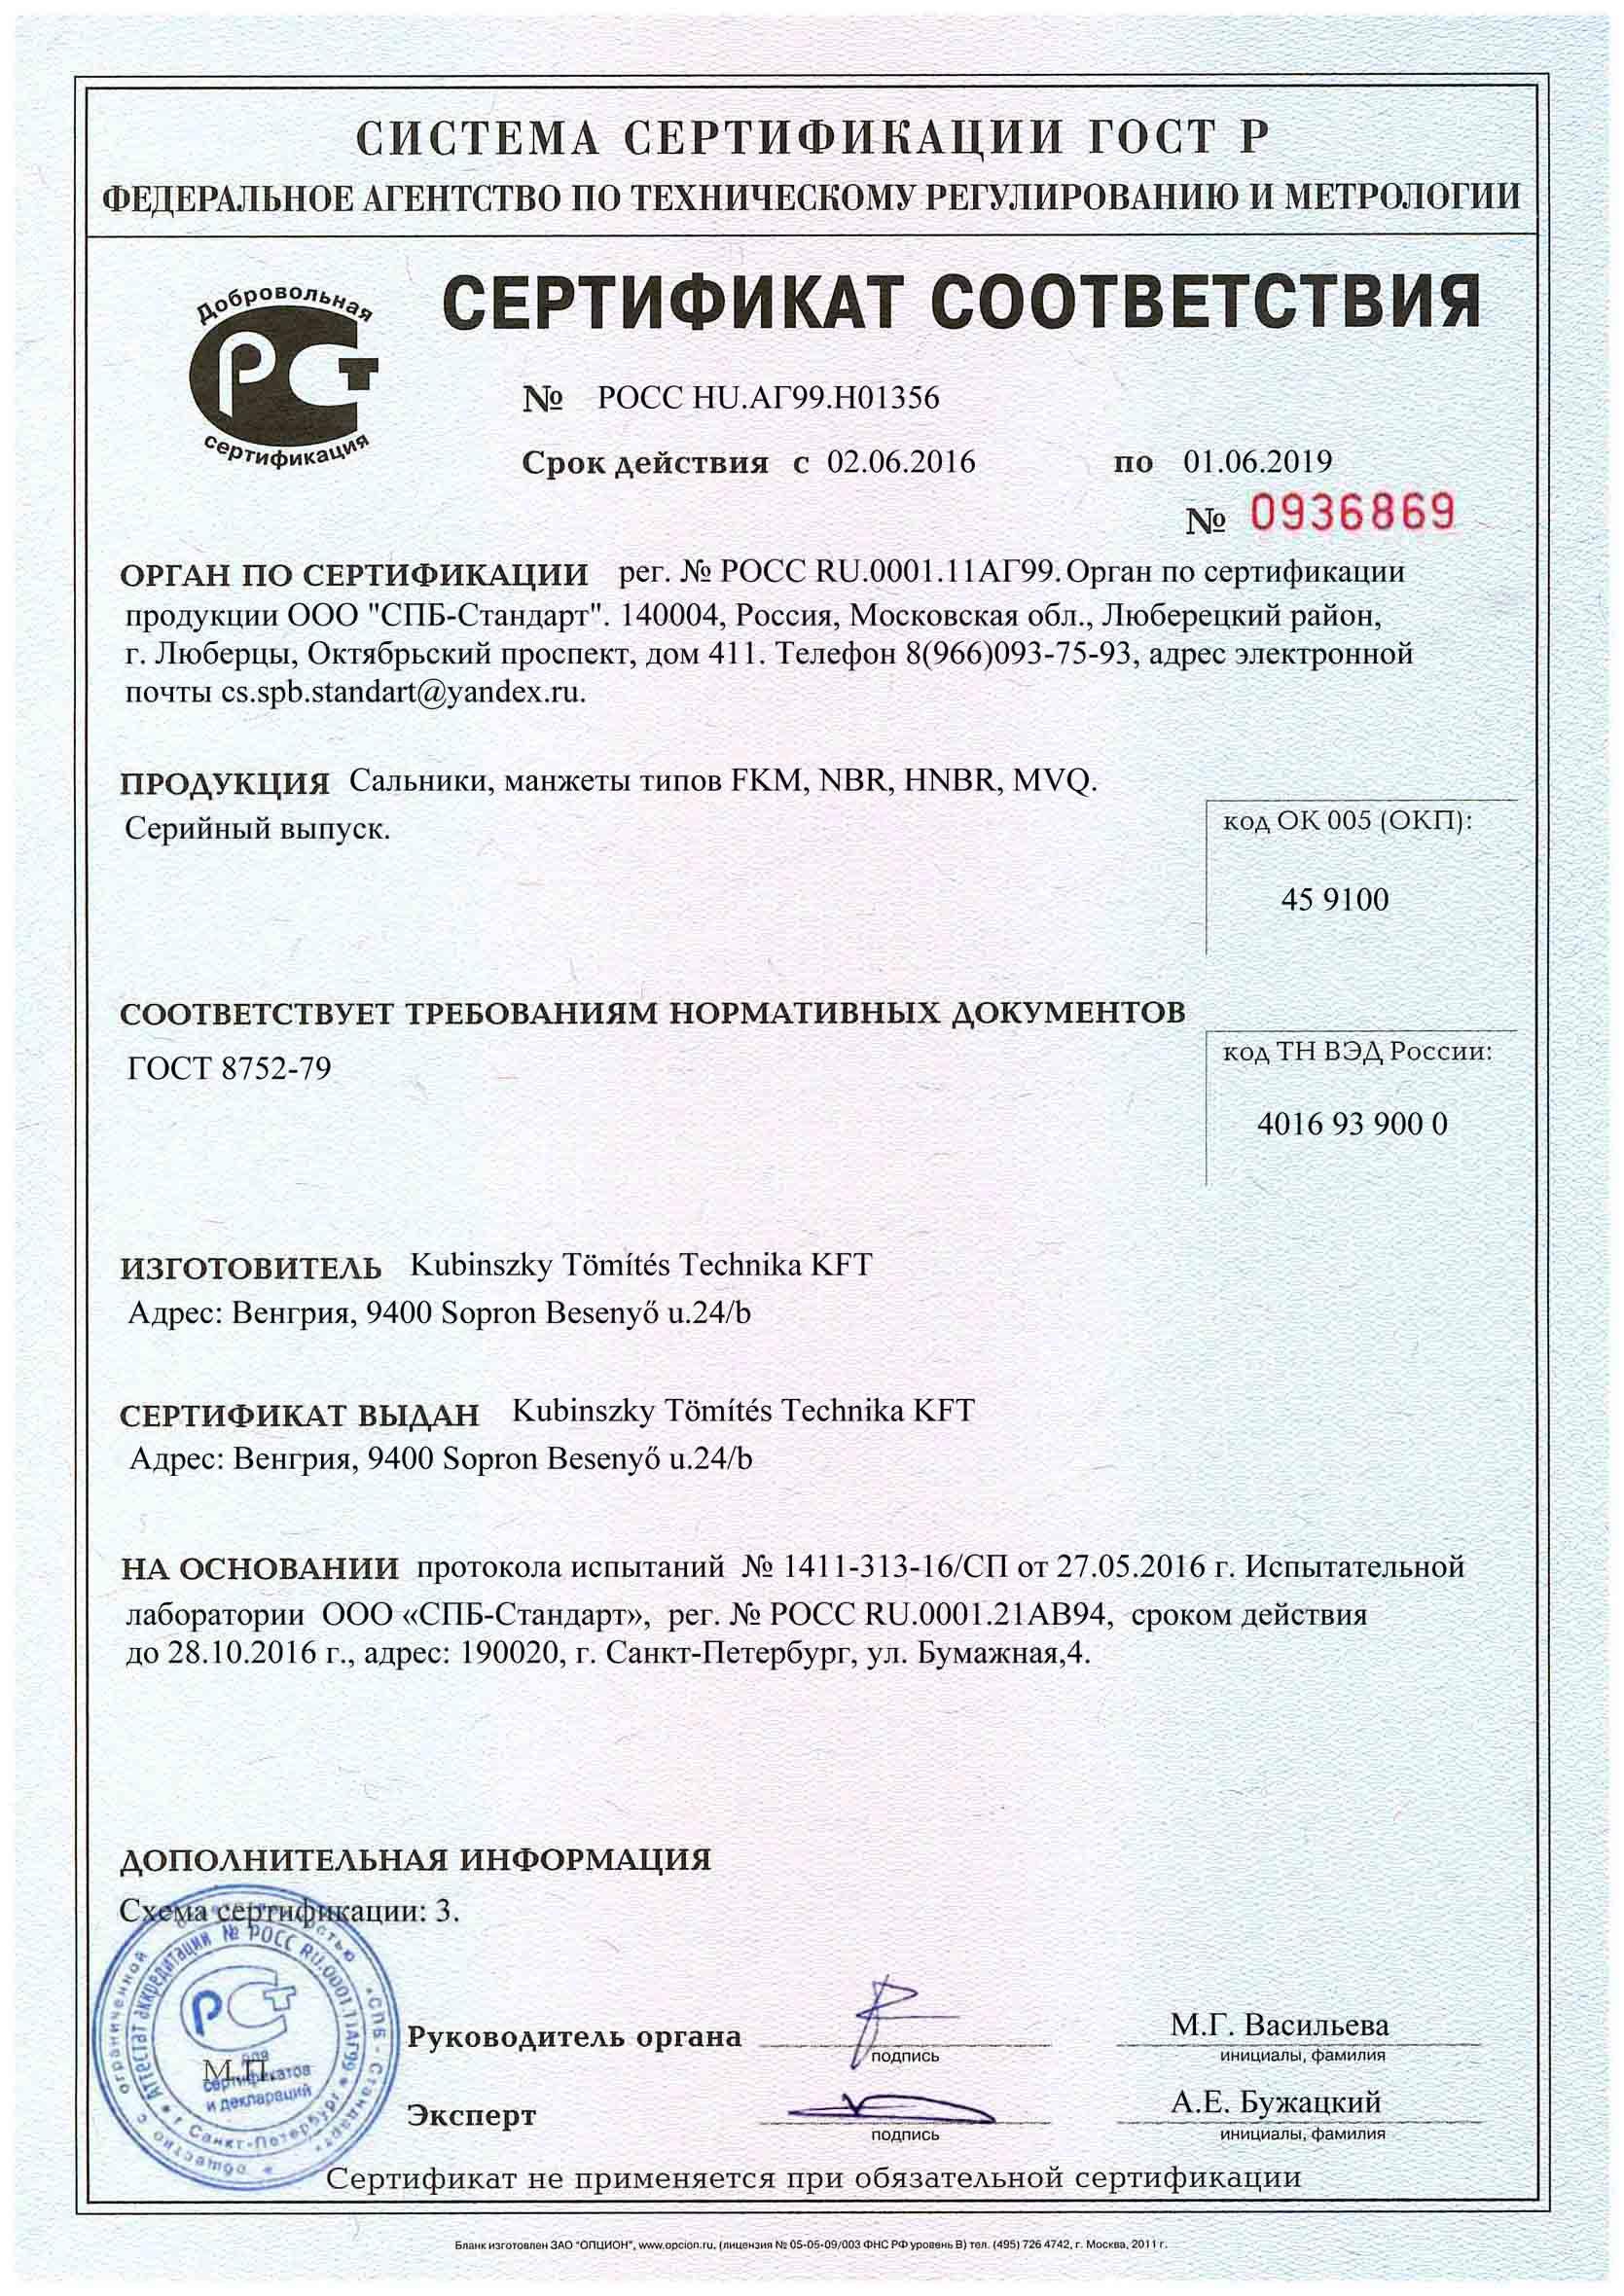 Скан Сертификат КТТ до 01.06.19